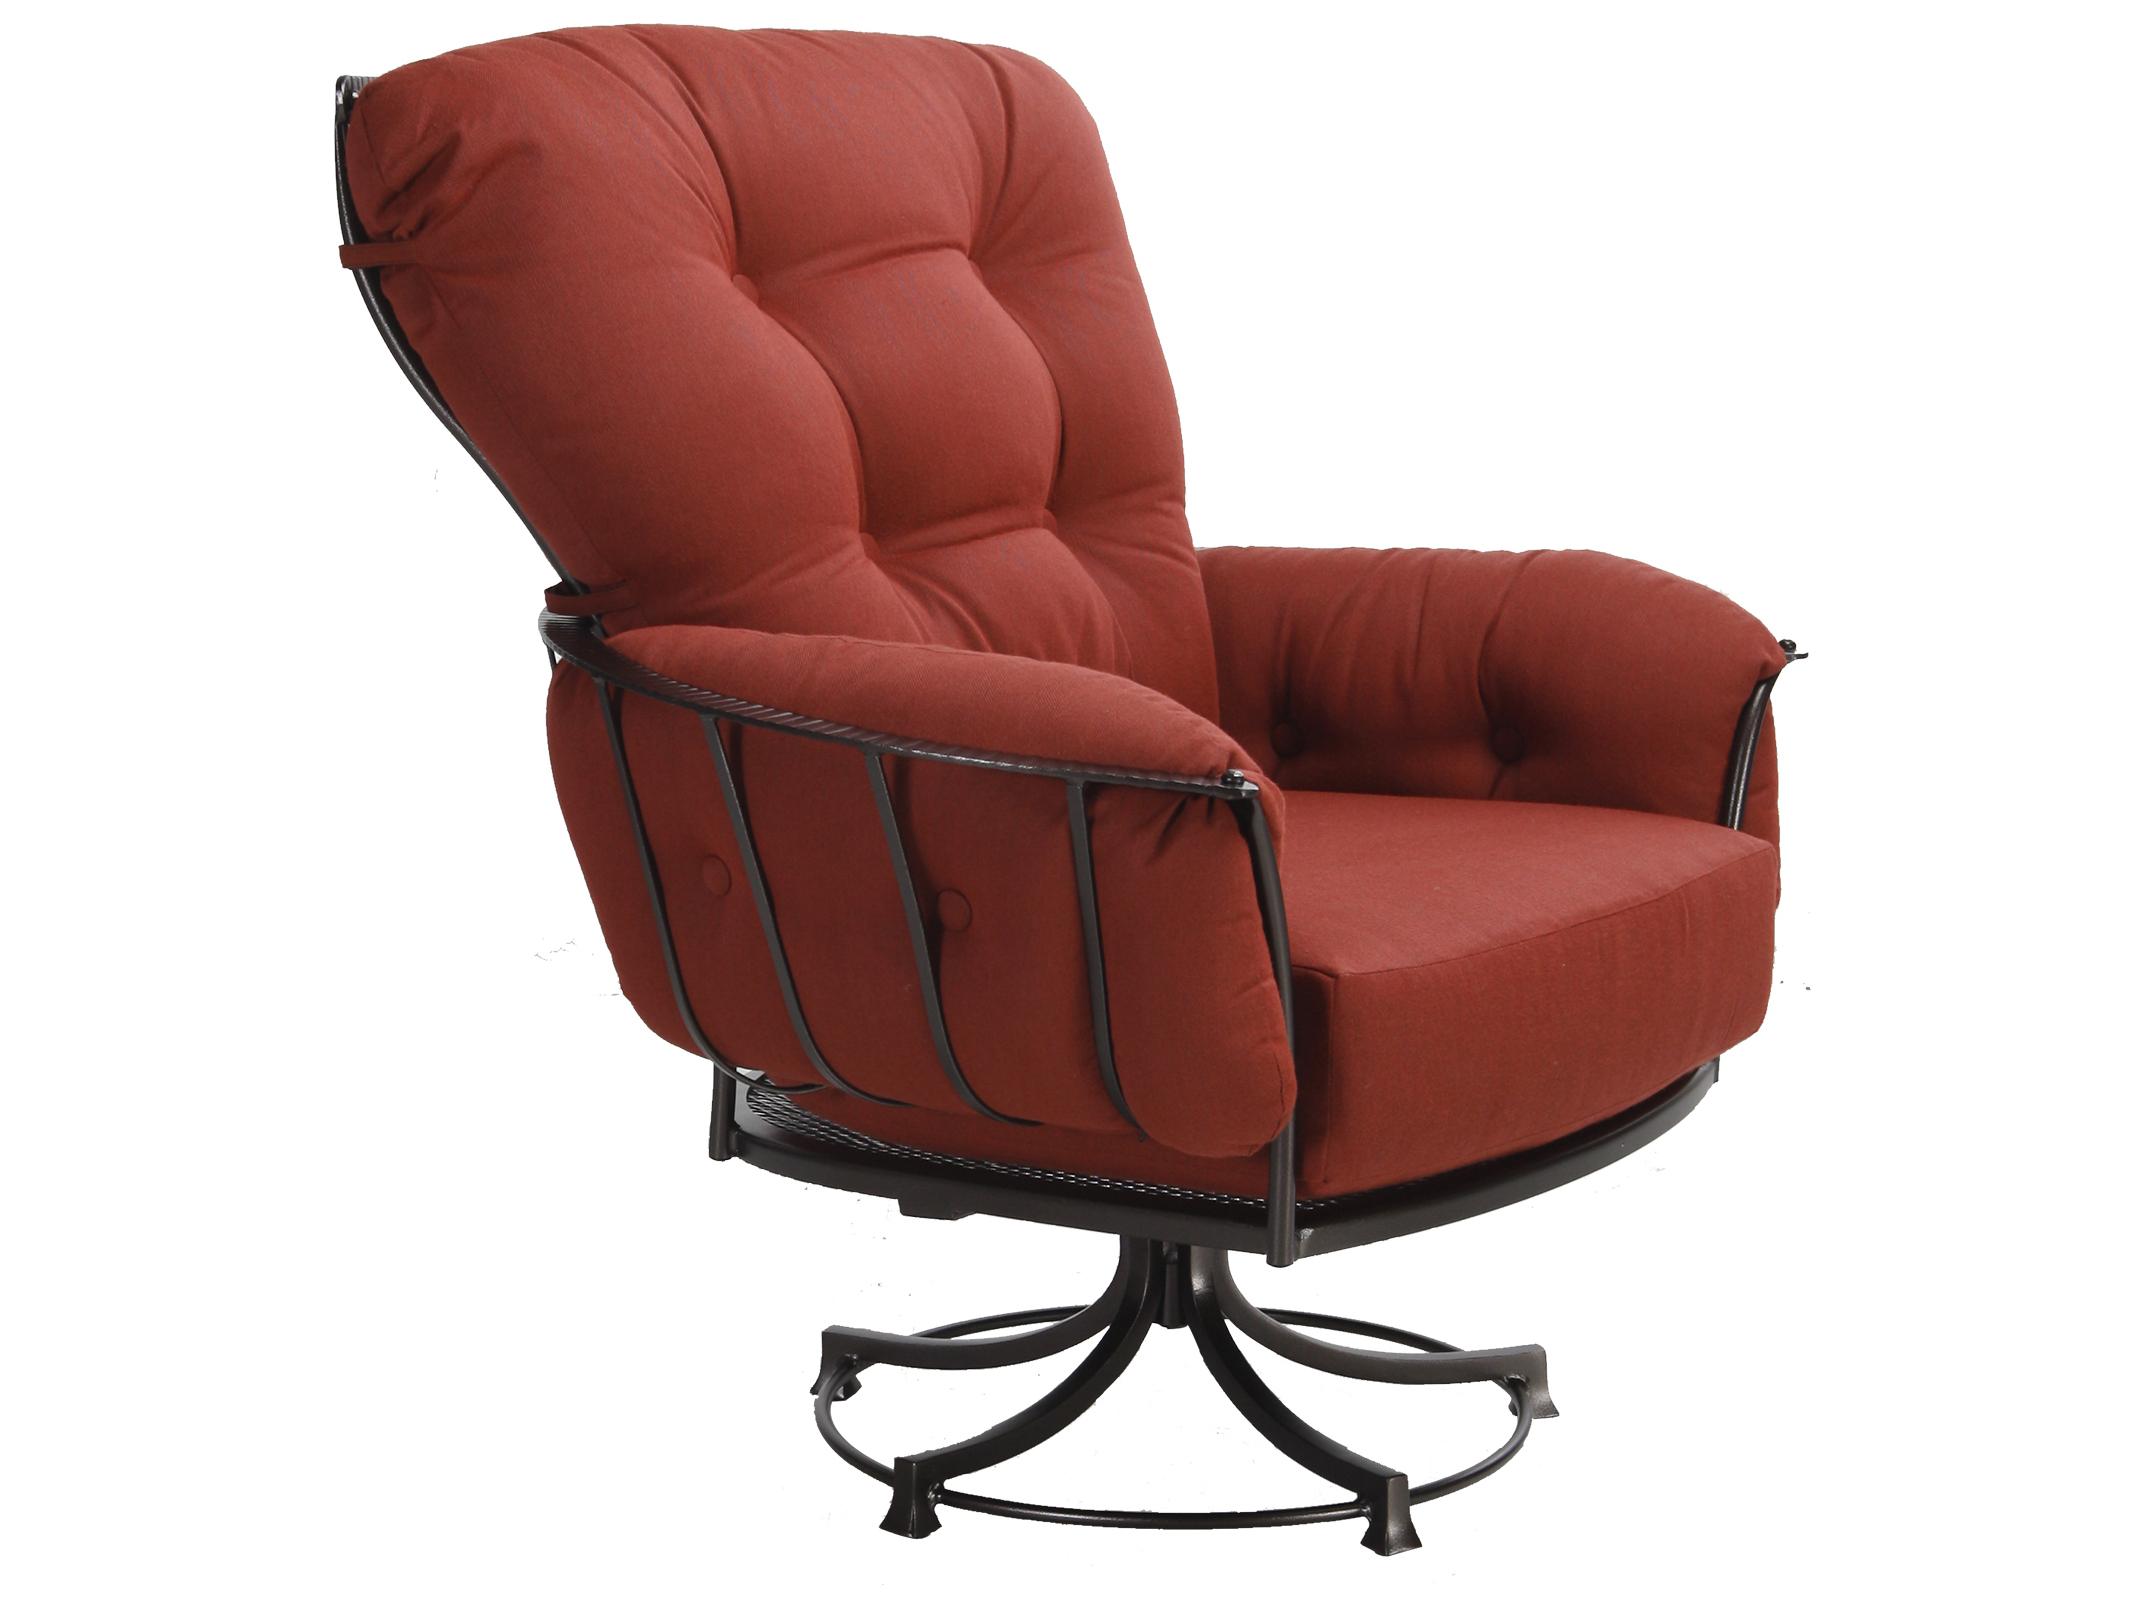 lounge chair covers spotlight ergonomic cost ow lee monterra wrought iron swivel rocker